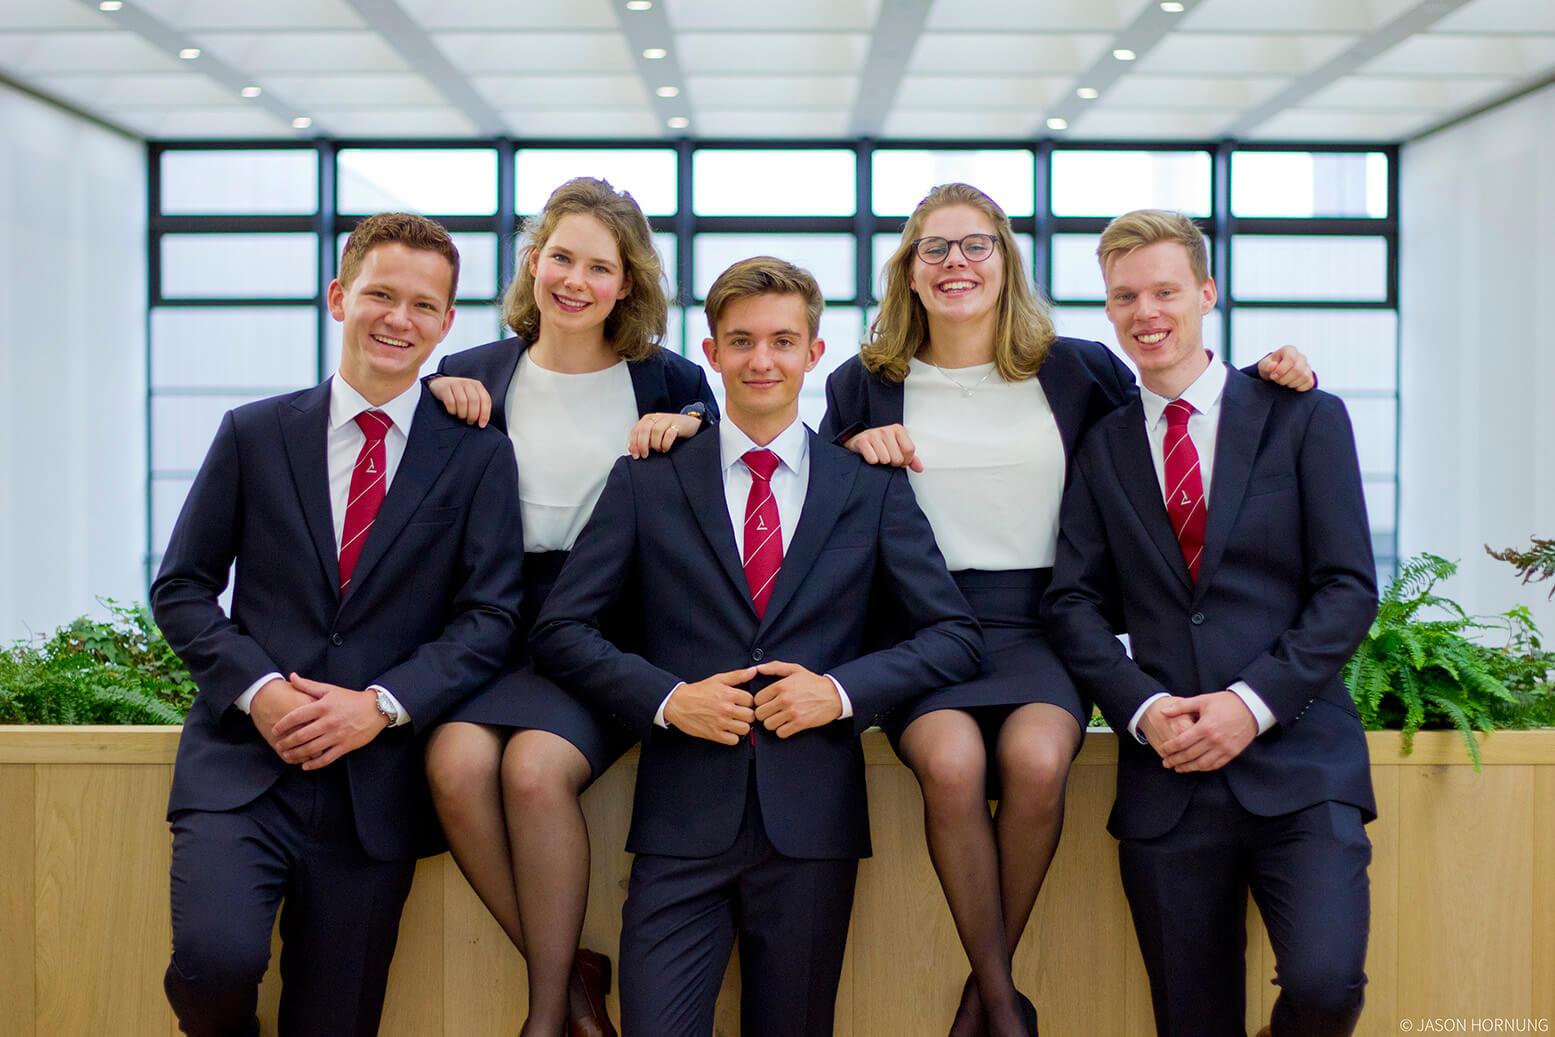 Hooke Bestuur 2017 Pak Student Bestuur Vereniging De Oost Bespoke Academy.jpg